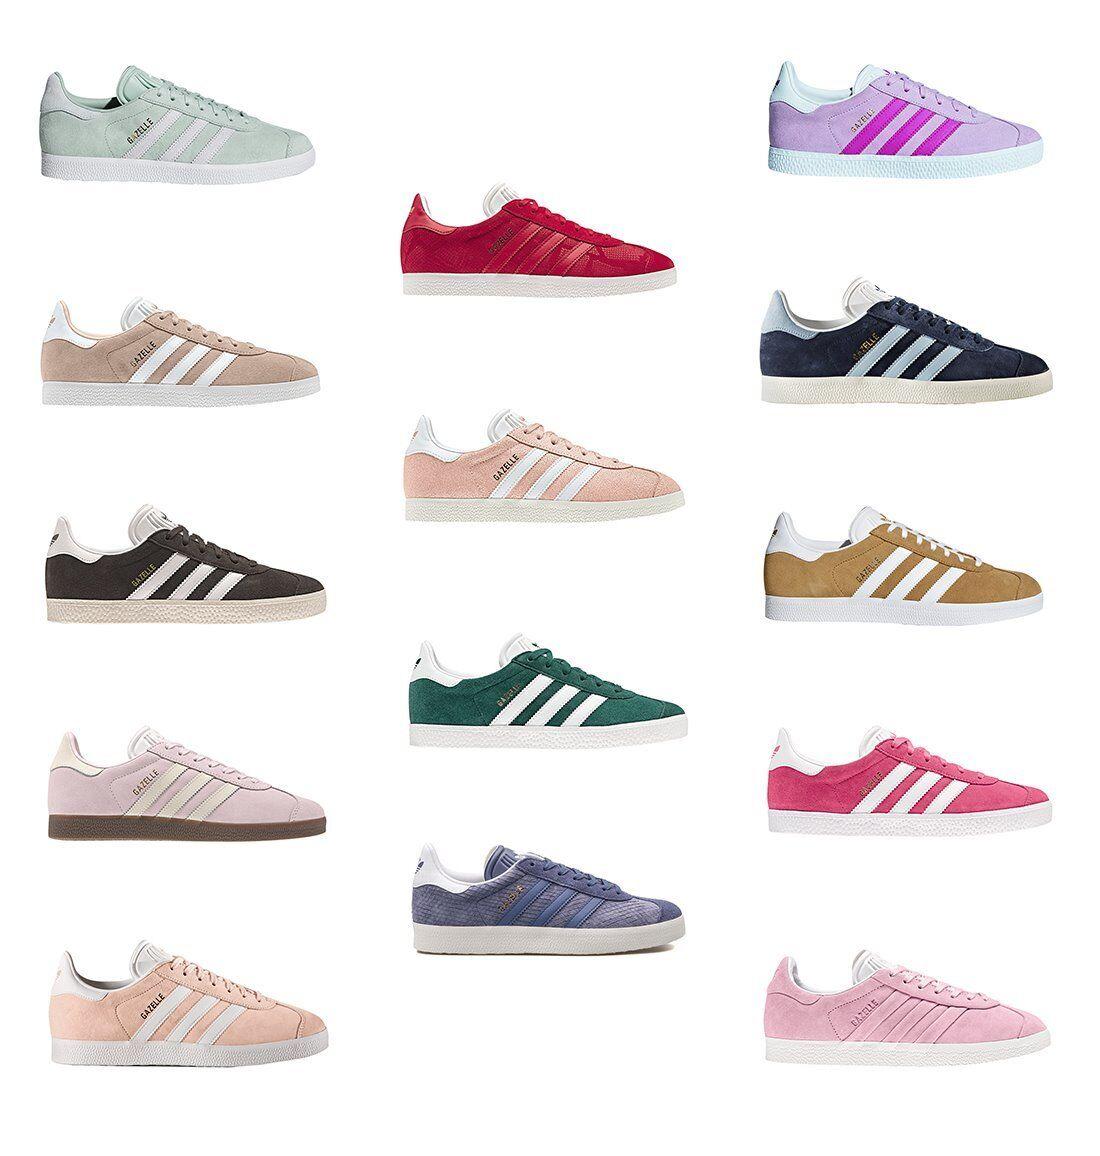 Adidas Originals Gazelle Turnschuhe Herren Damen Kinder Freizeitschuhe Turnschuhe